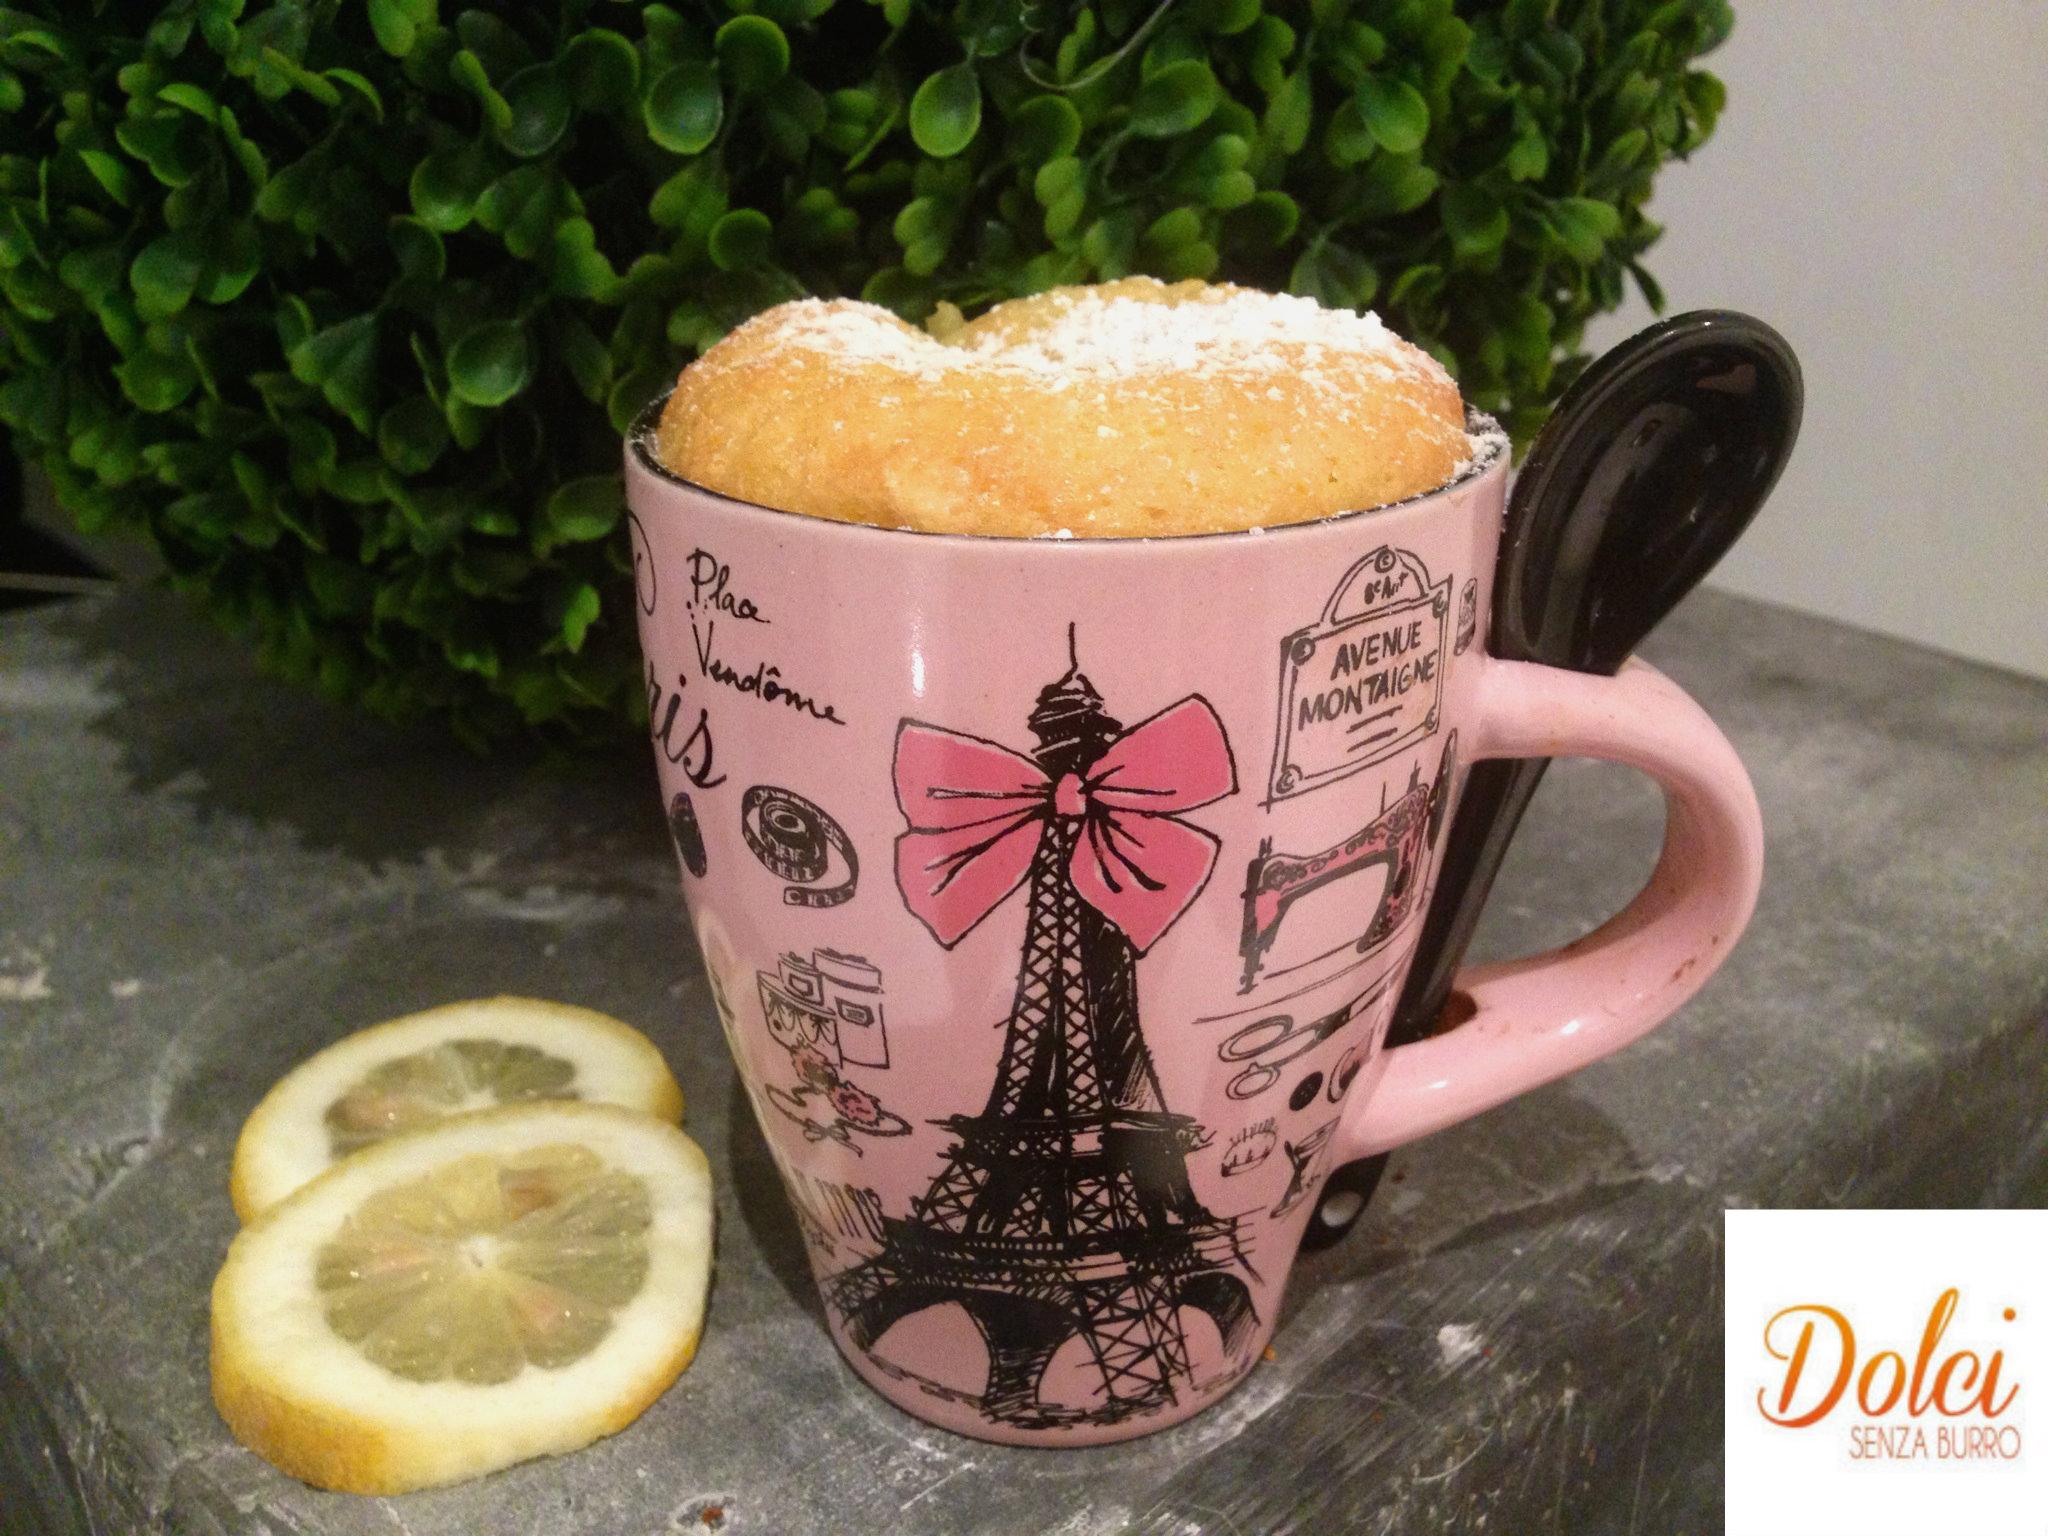 Lemon Mug Cake Senza Burro, la torta in tazza di dolci senza burro